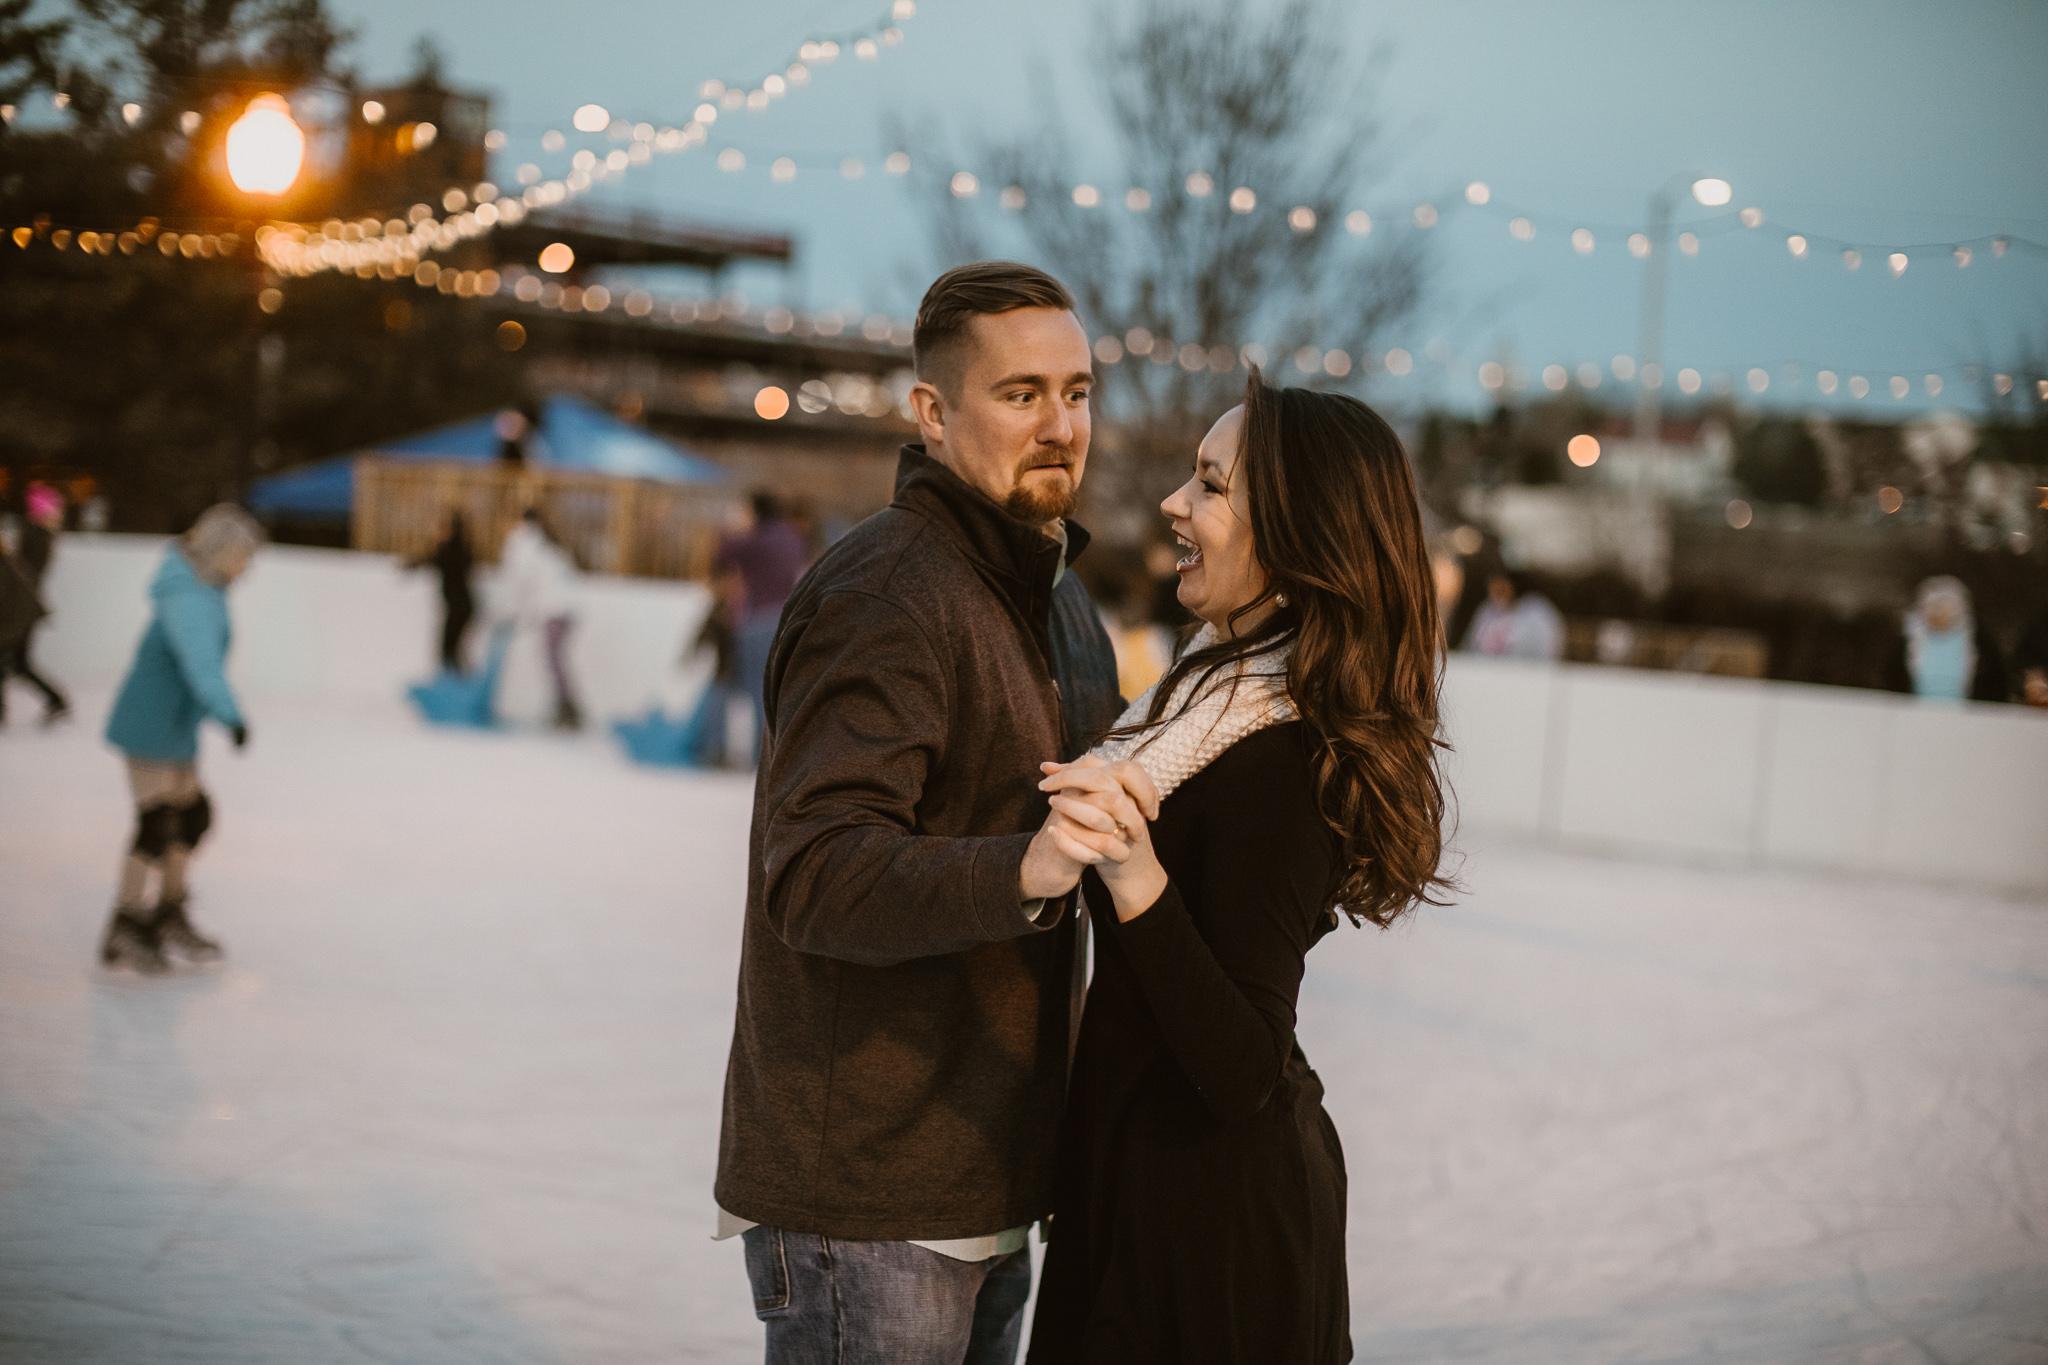 Engagement - Tree picking - Wedding Photographer - Virginia - Best - Pat Cori Photography-33.jpg